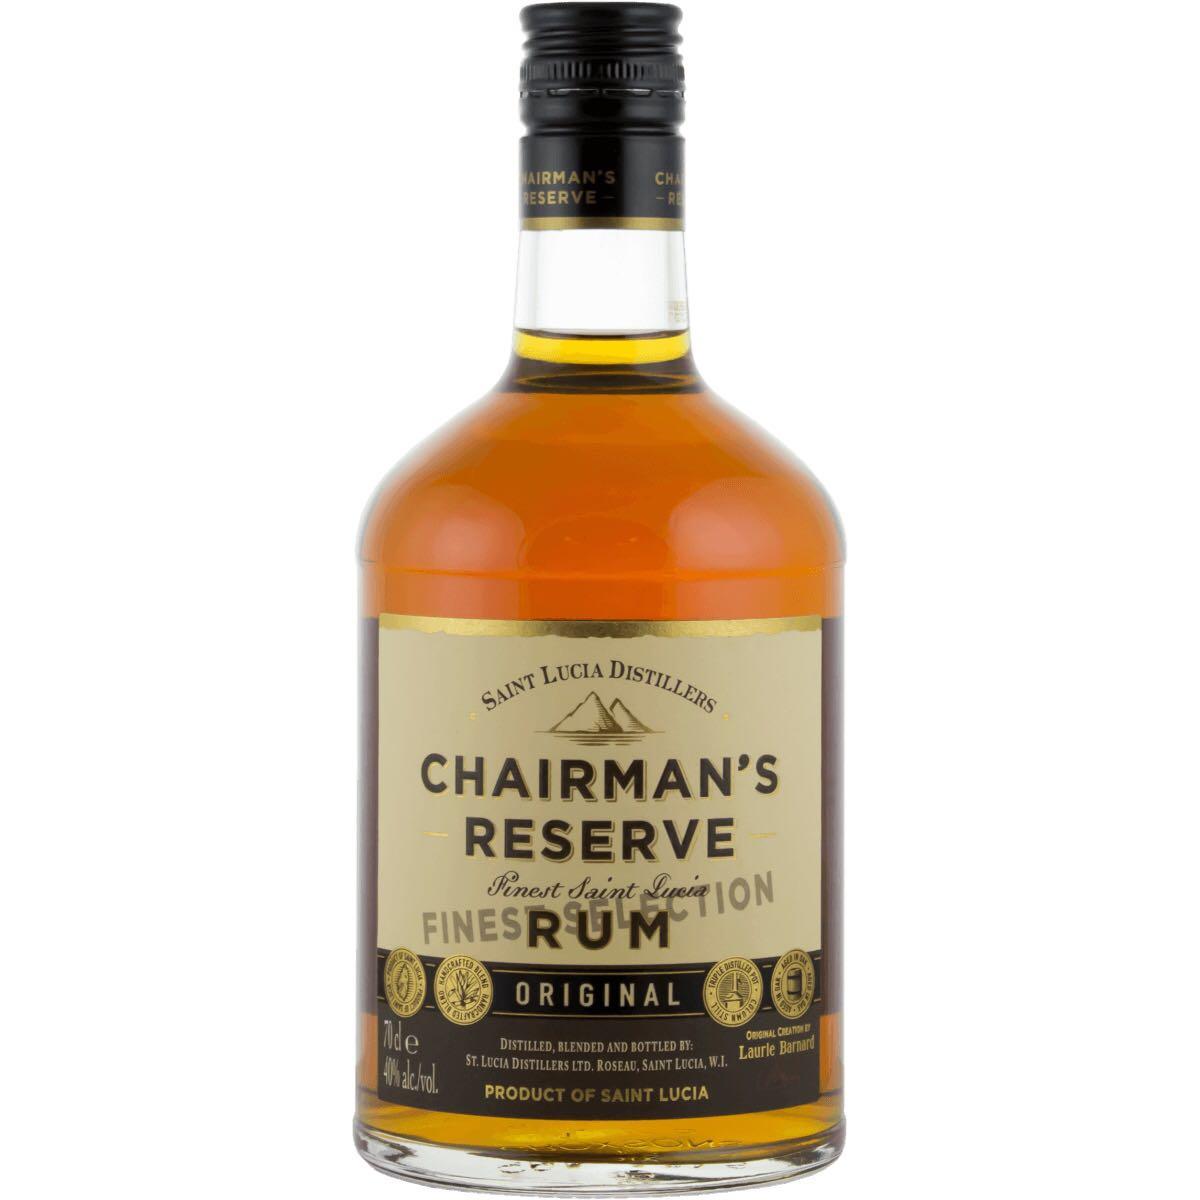 Bottle image of Chairman's Reserve Original